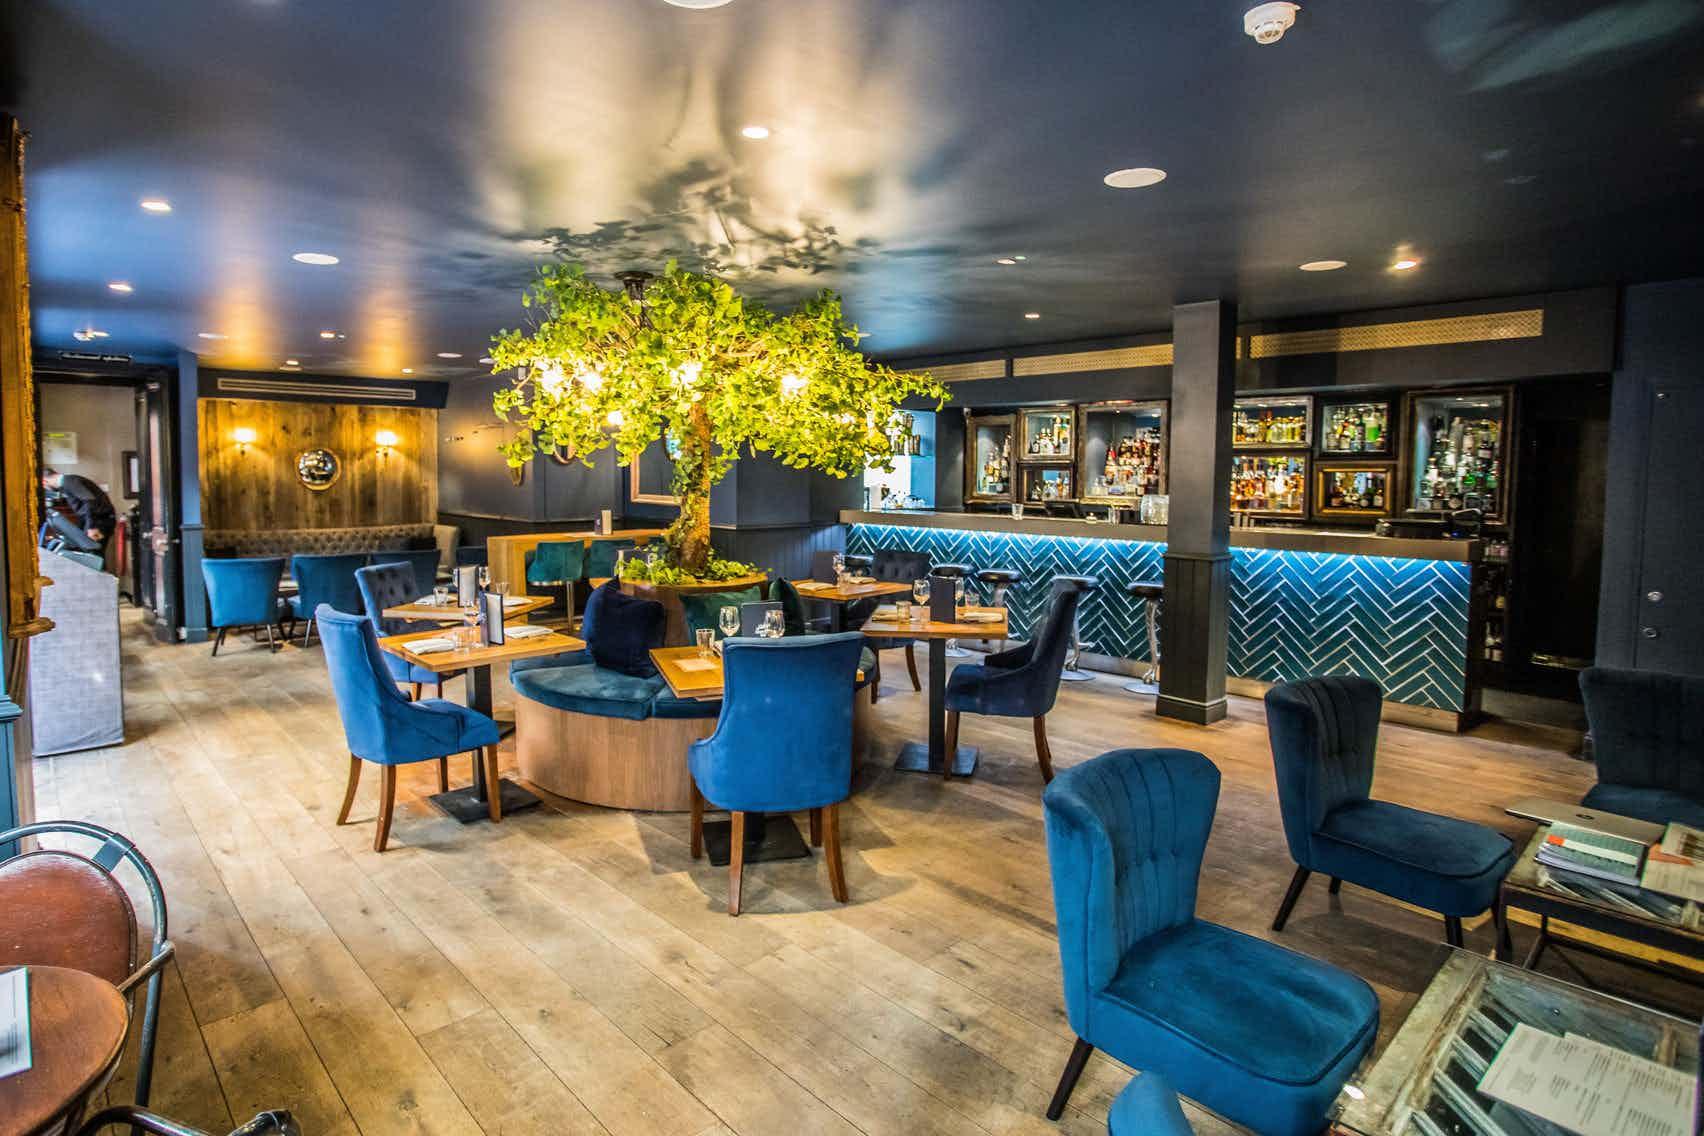 Mews Cocktail Bar, Mews of Mayfair